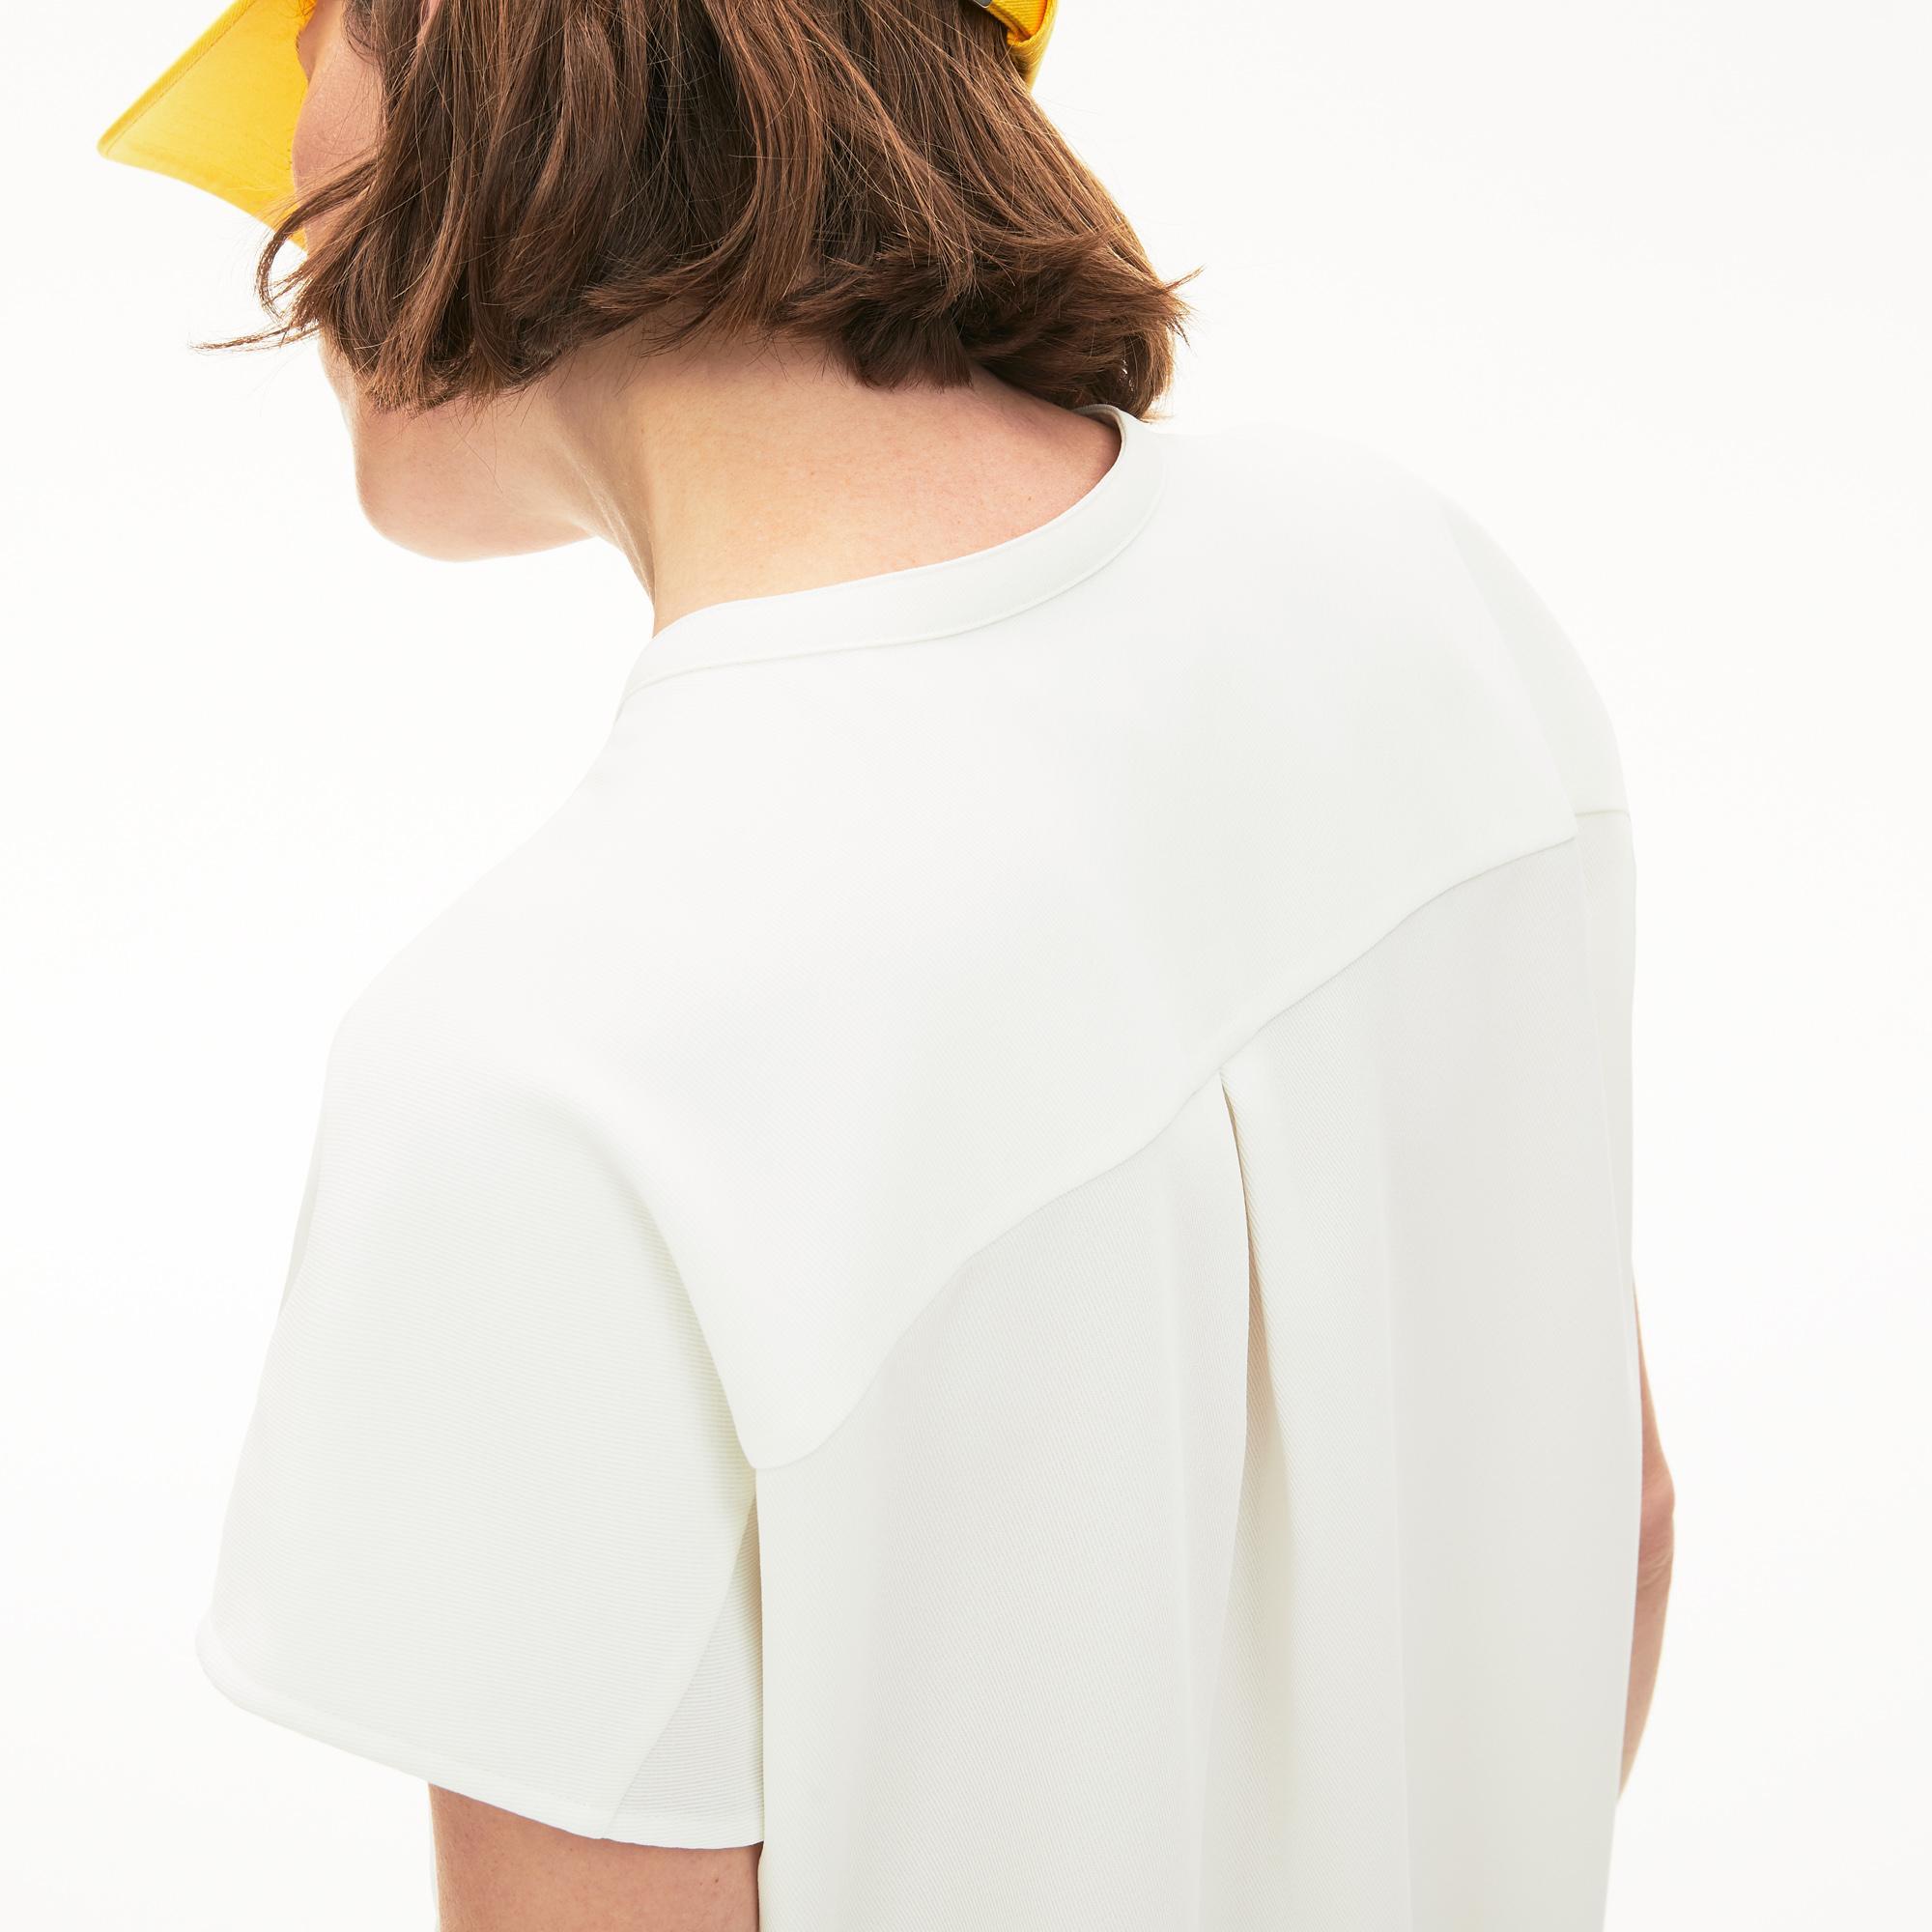 Lacoste Damska Elegancka Koszula Bez Rękawów